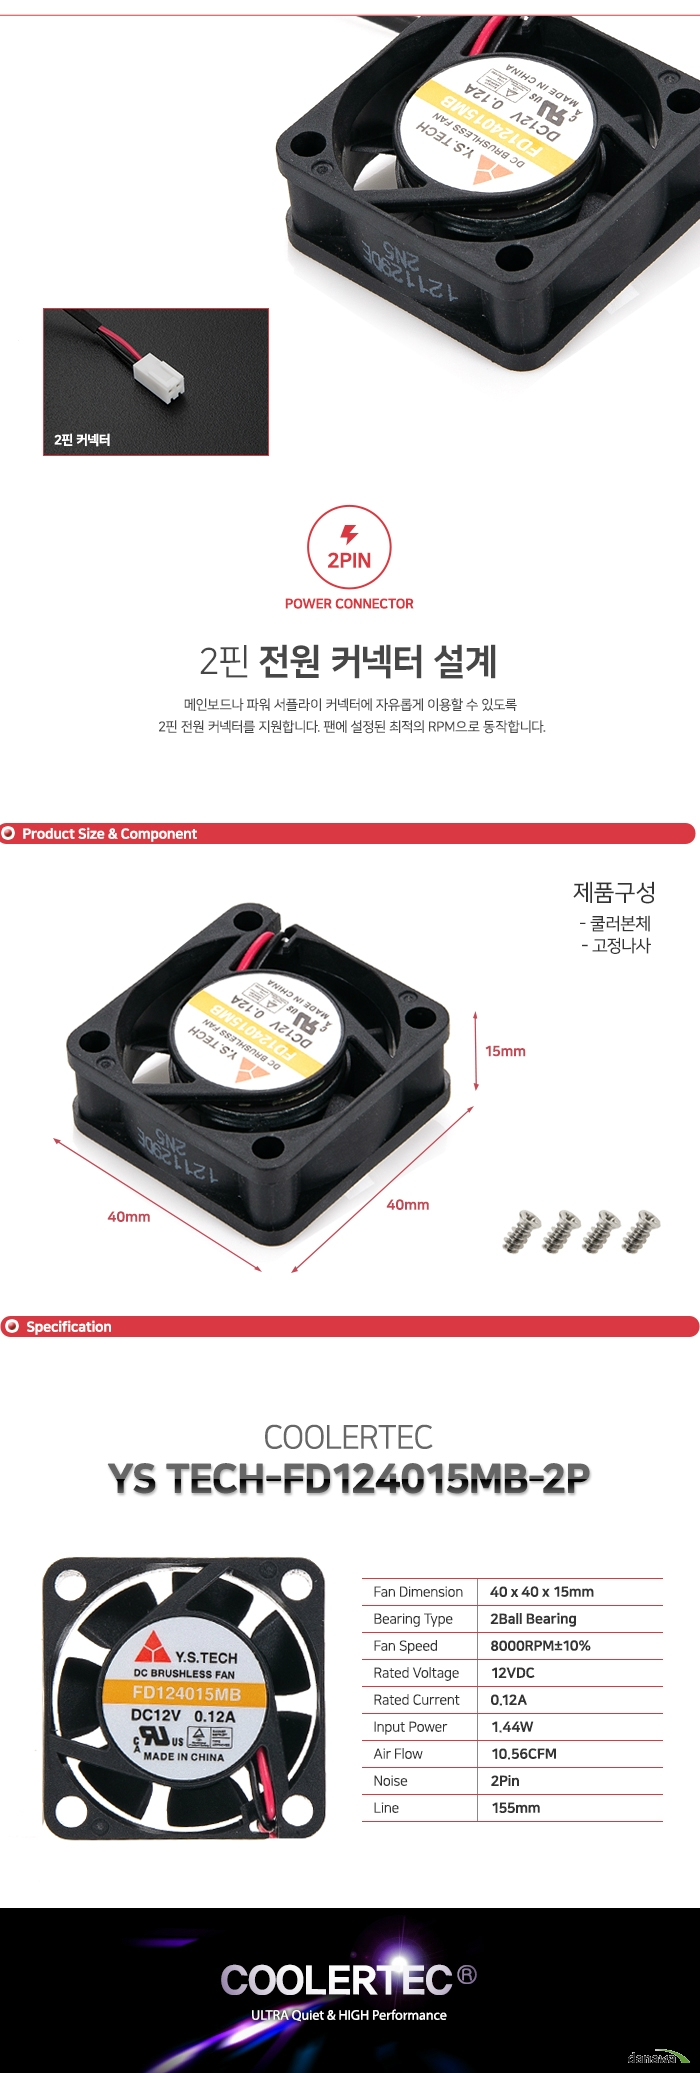 COOLERTEC  YS TECH-FD124015MB-2P